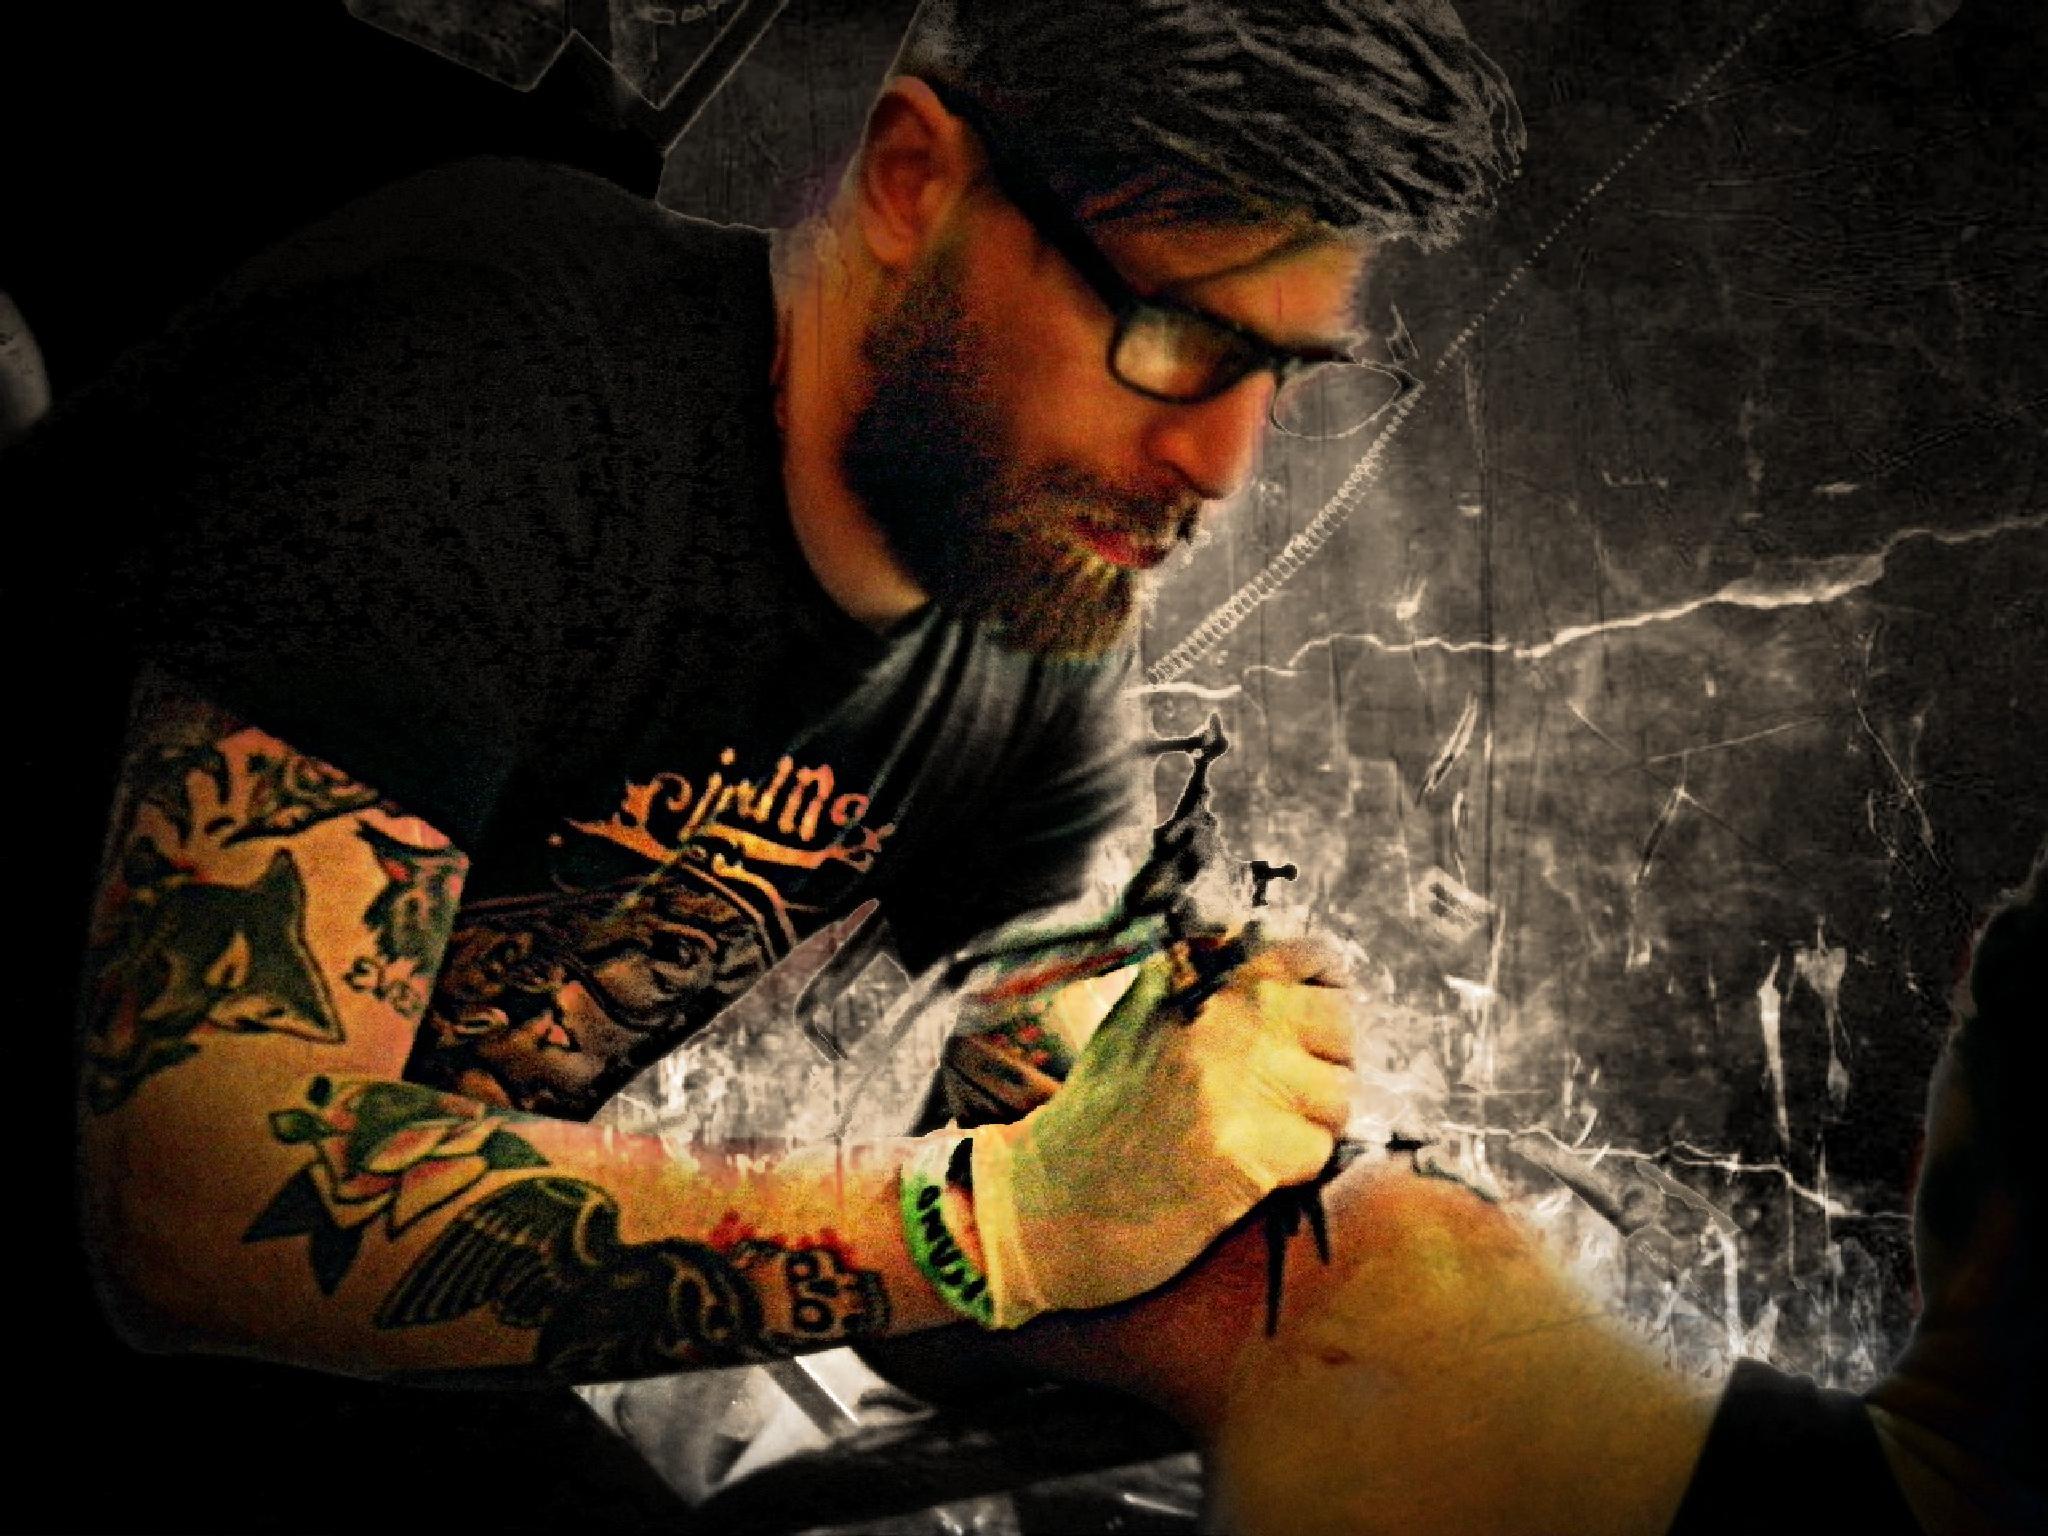 Tattoo Art by rollnstef